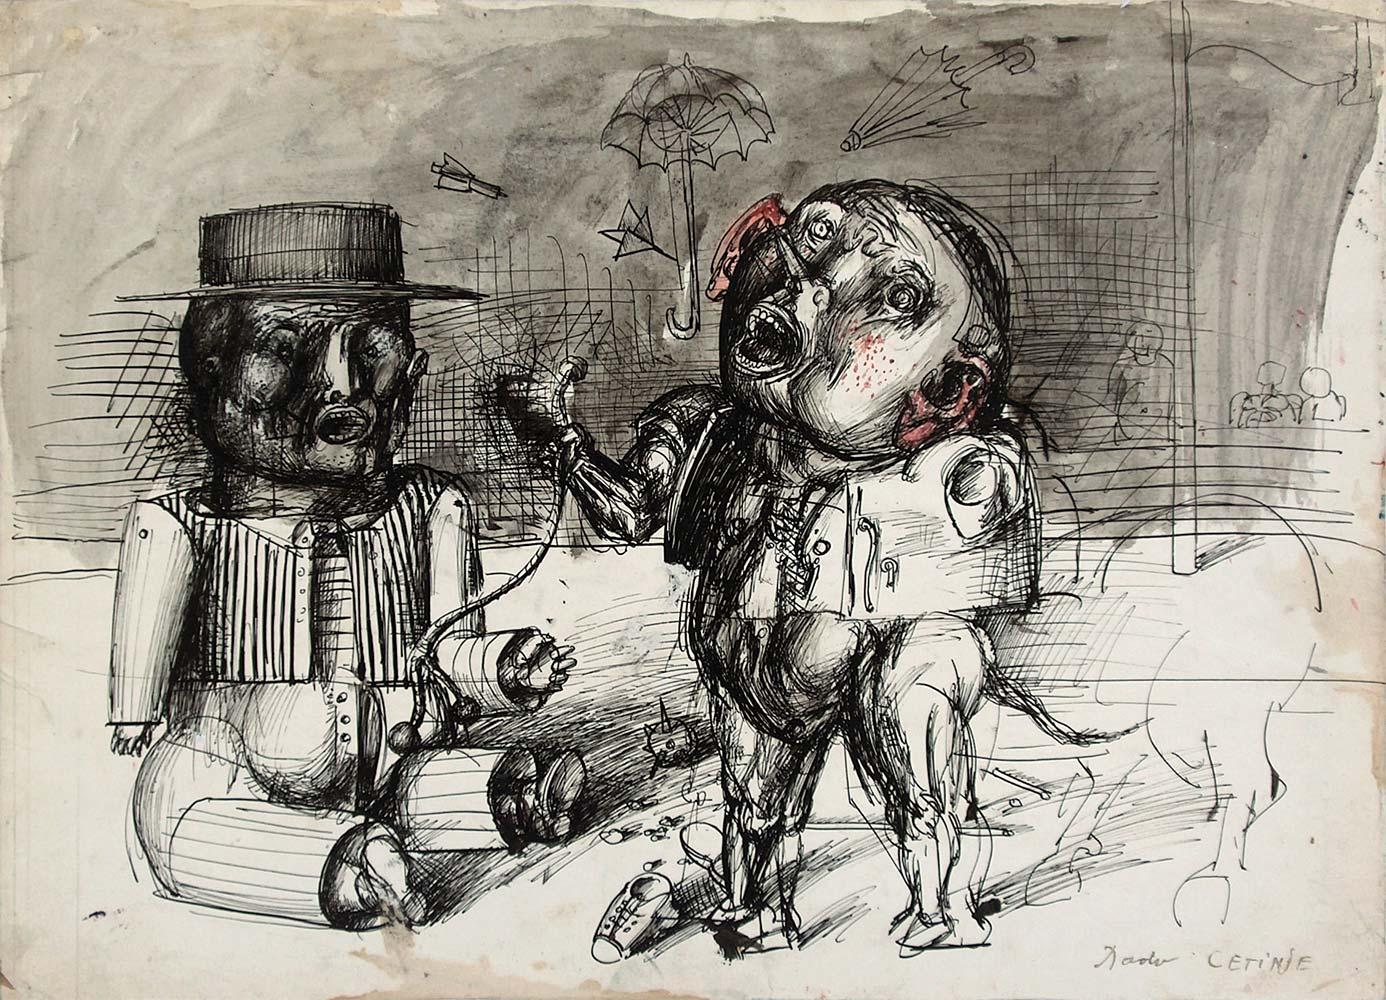 Dadov crtež: Čovjek s kišobranom